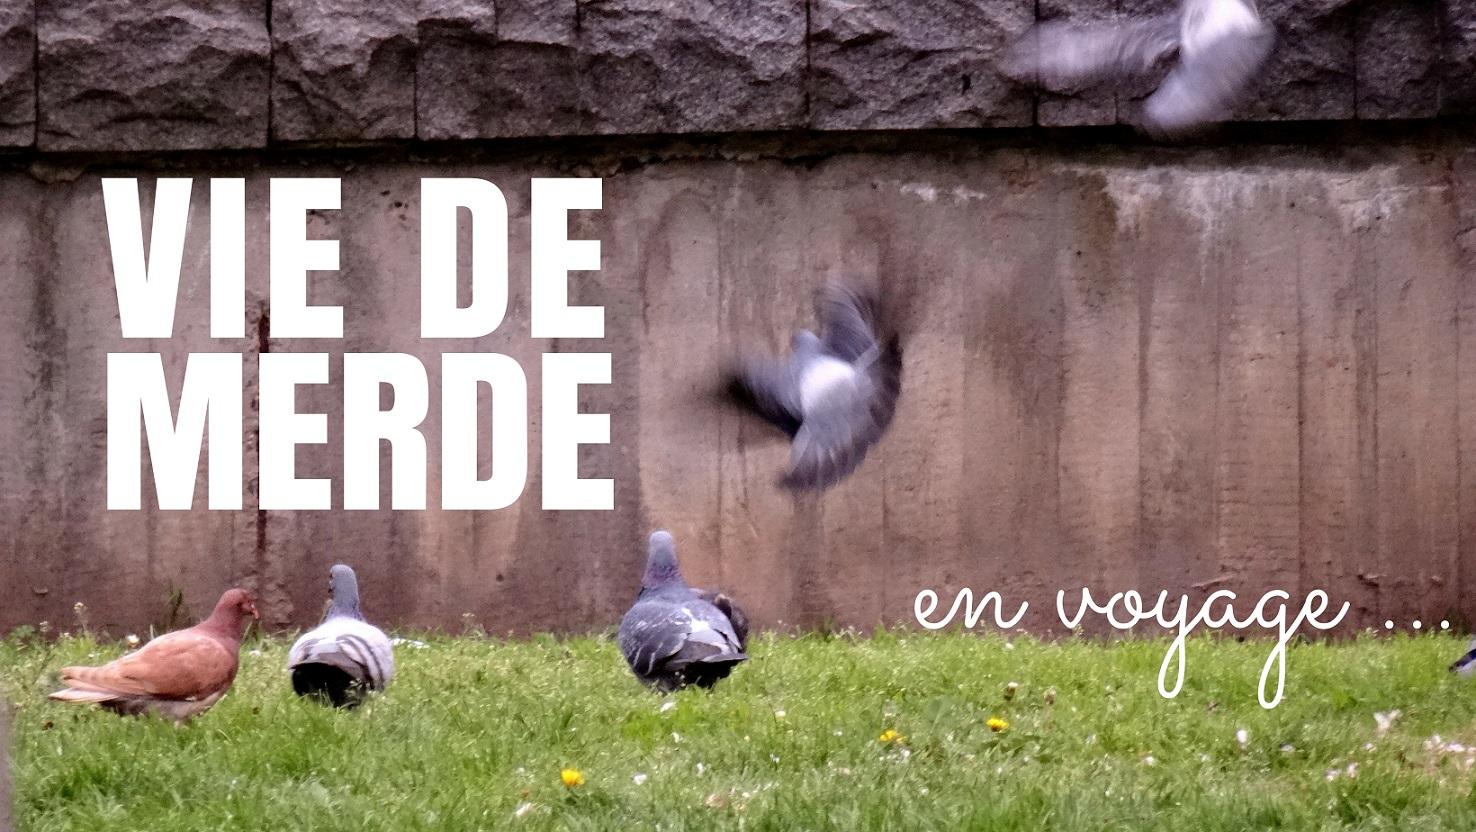 #VieDeMerde en voyage